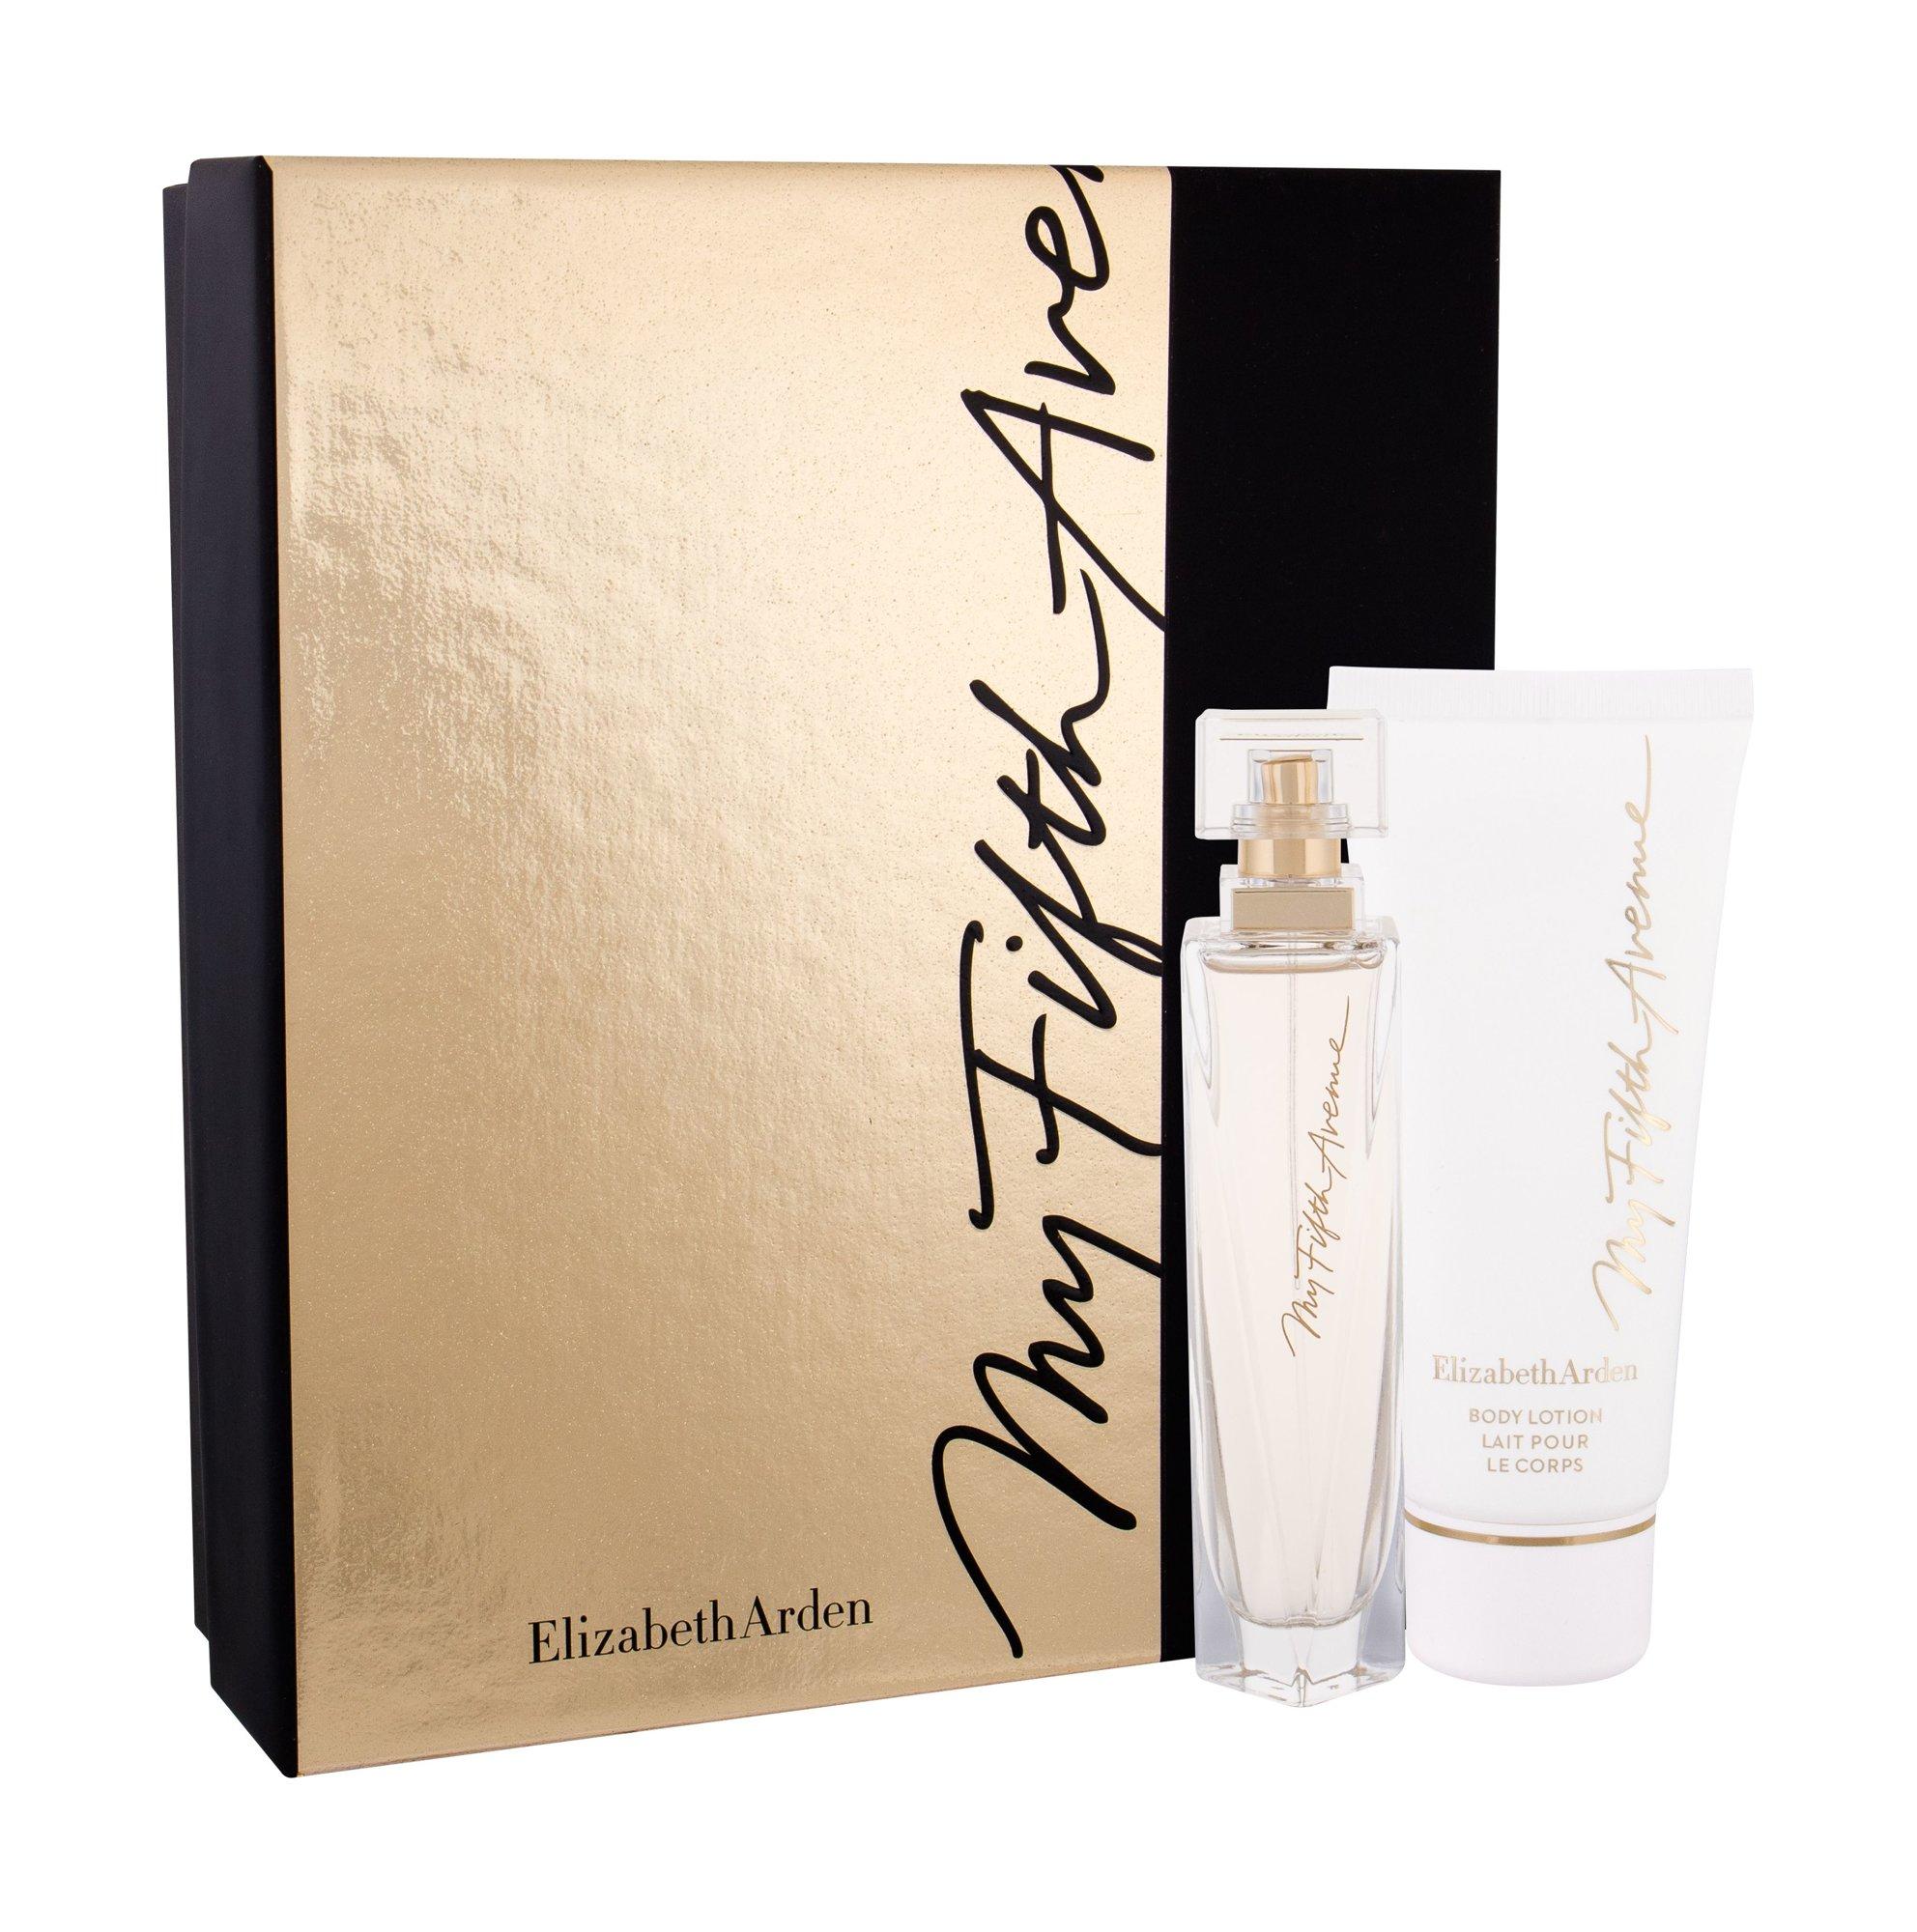 Elizabeth Arden My Fifth Avenue Eau de Parfum 50ml